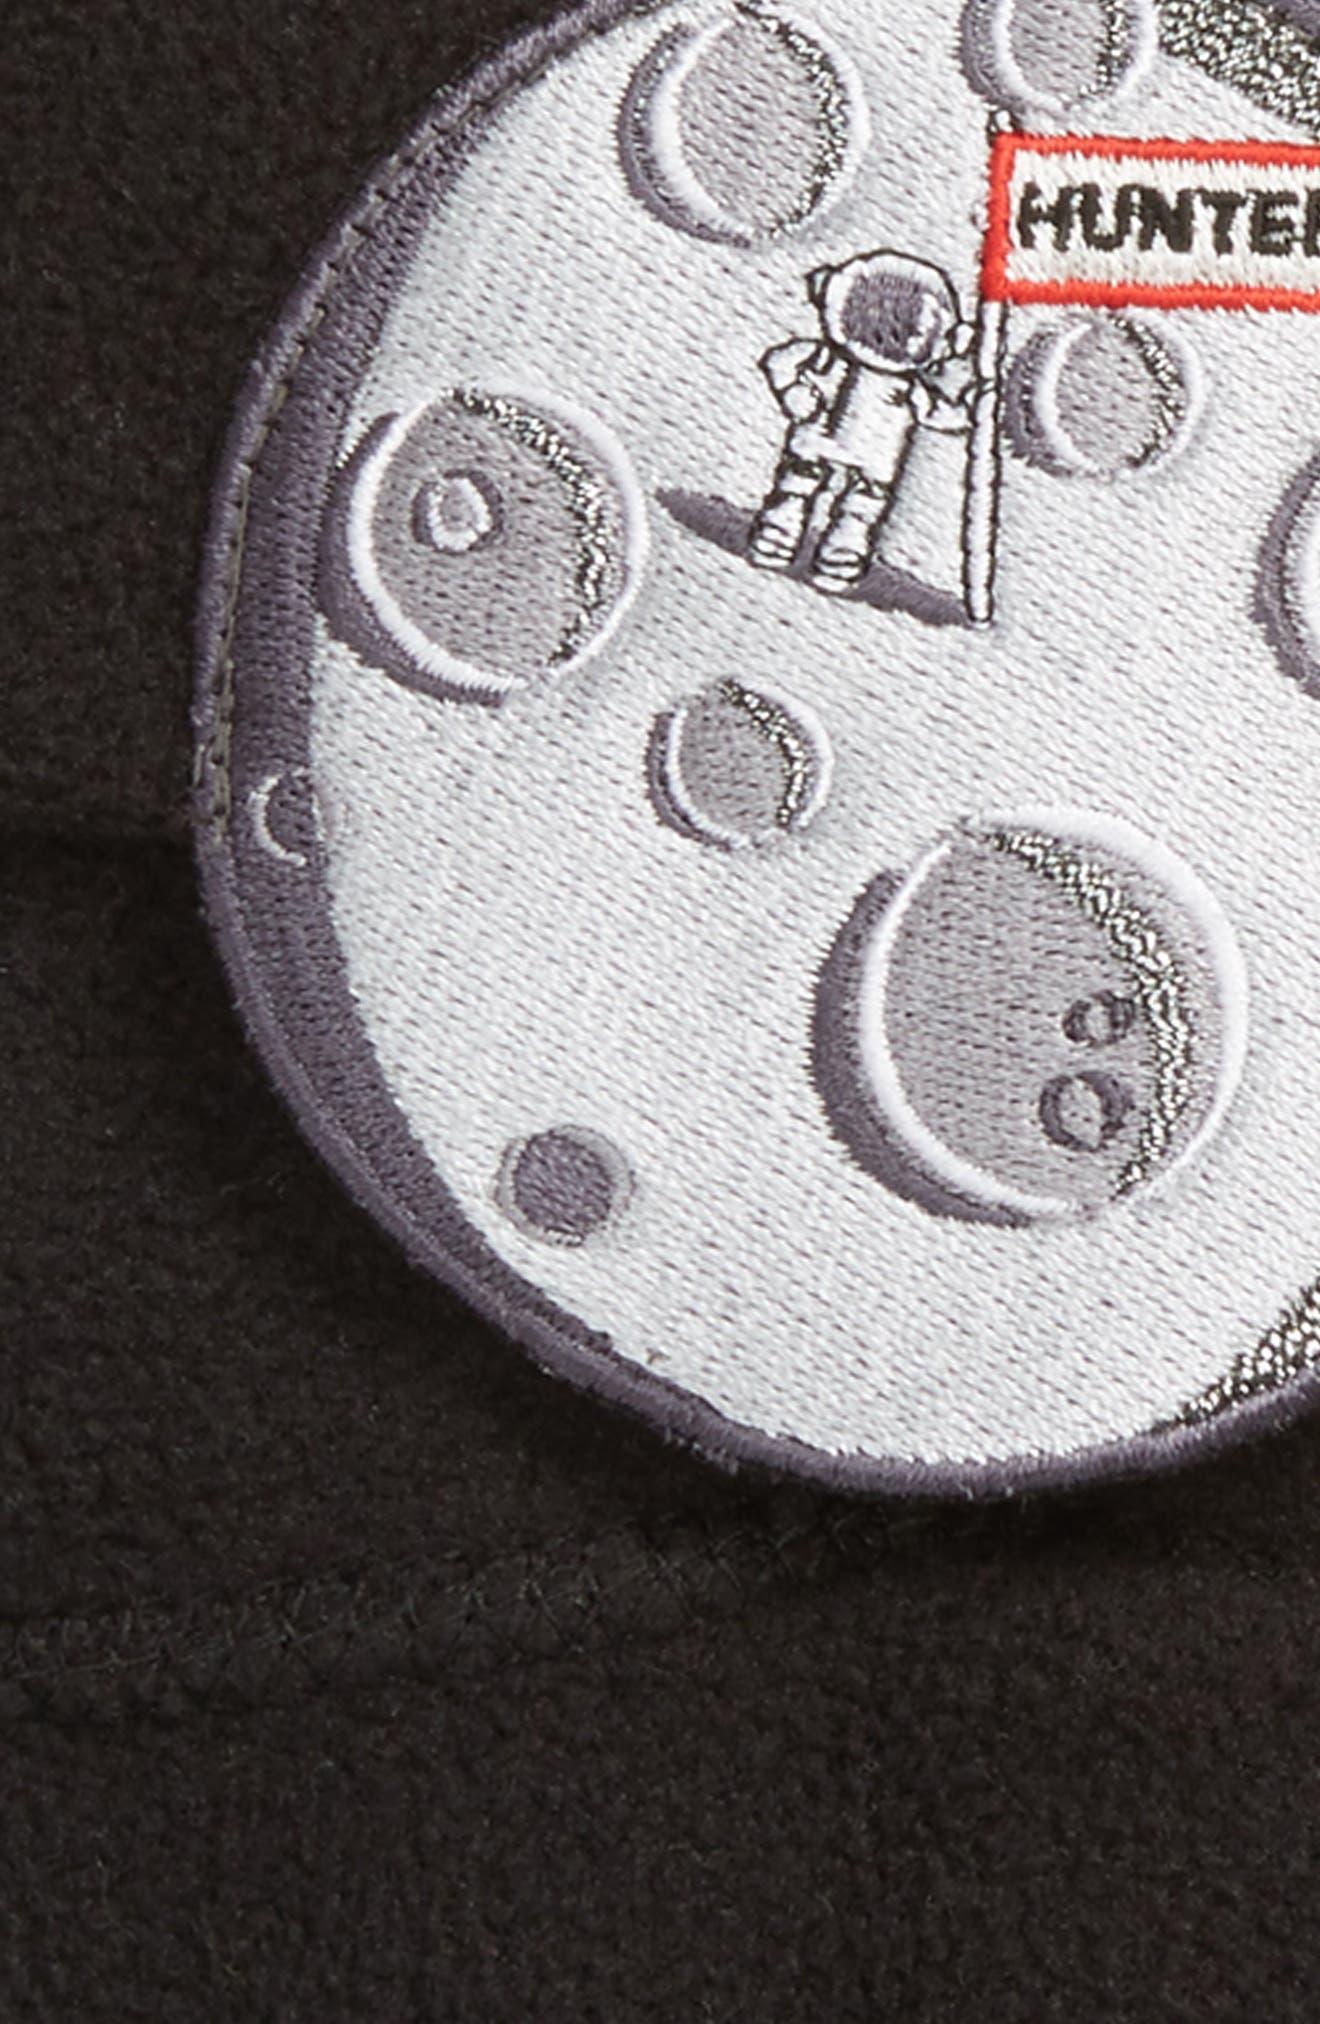 Spaceship/Moon Boot Socks,                             Alternate thumbnail 2, color,                             019